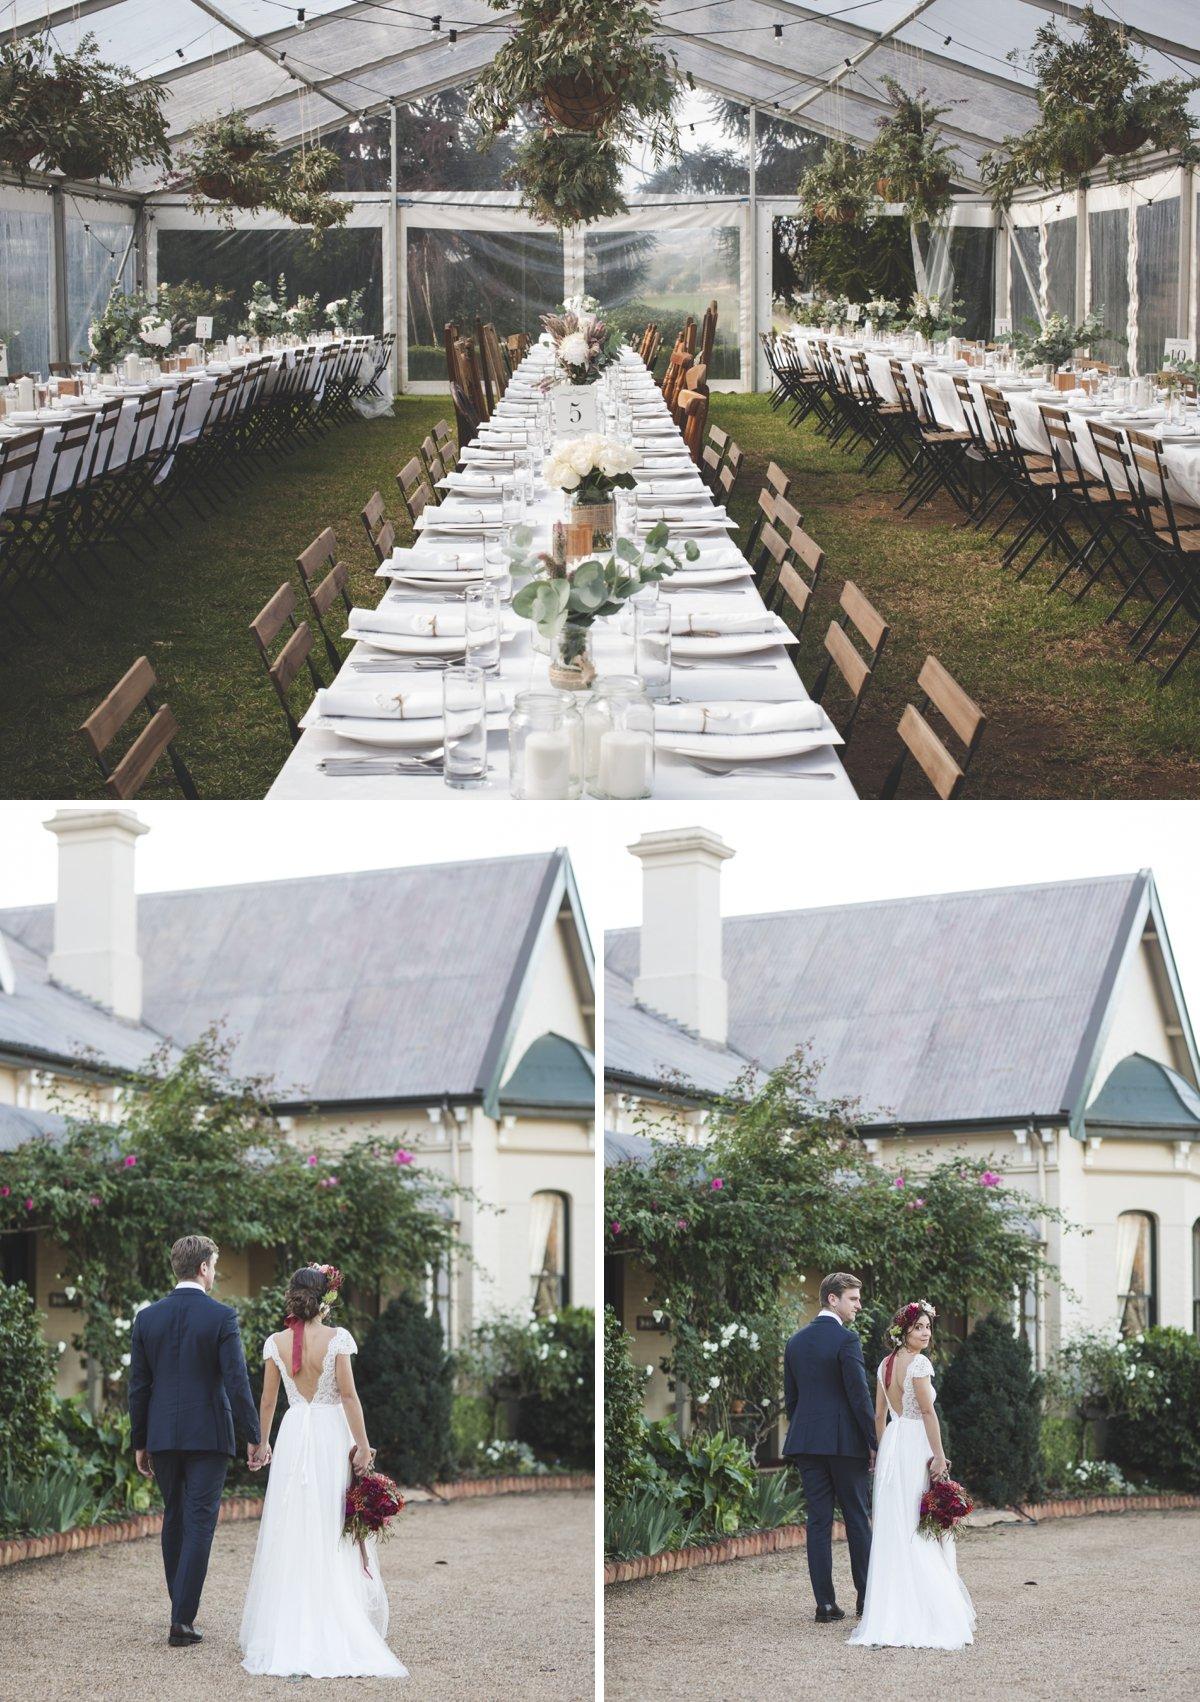 Wagga Wagga Wedding Photographer at Borambola Winery Wagga Wagga Albury wedding photographer Culcairn wedding venue_1089